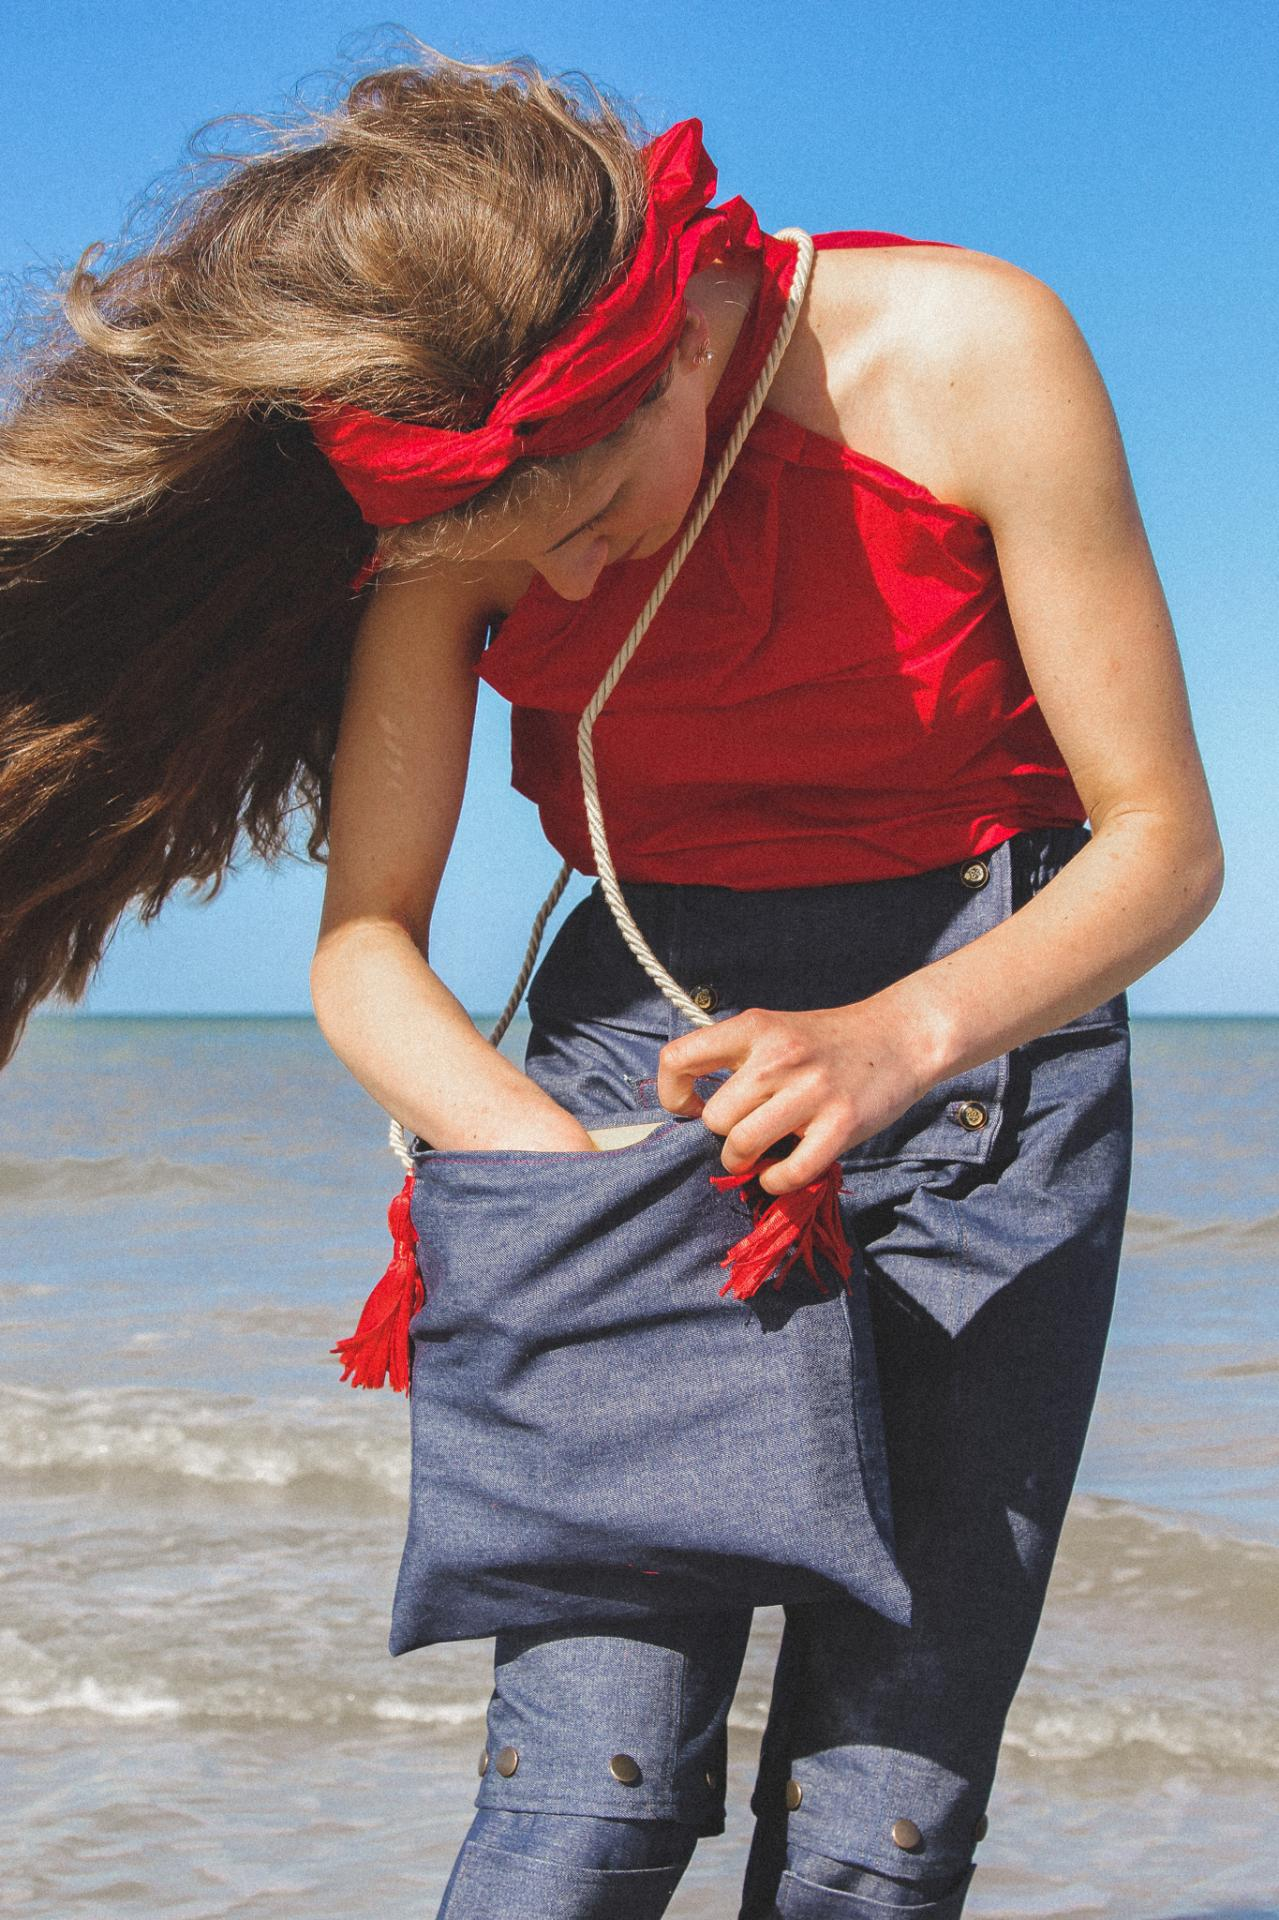 Danseuse et mannequin Félicie porte la tenue 'Brise marine' de la Collection Fifi au jardin Printemps-Eté 2021_copyright Fifi au jardin 2020-2021 Un grand vent de fleurs